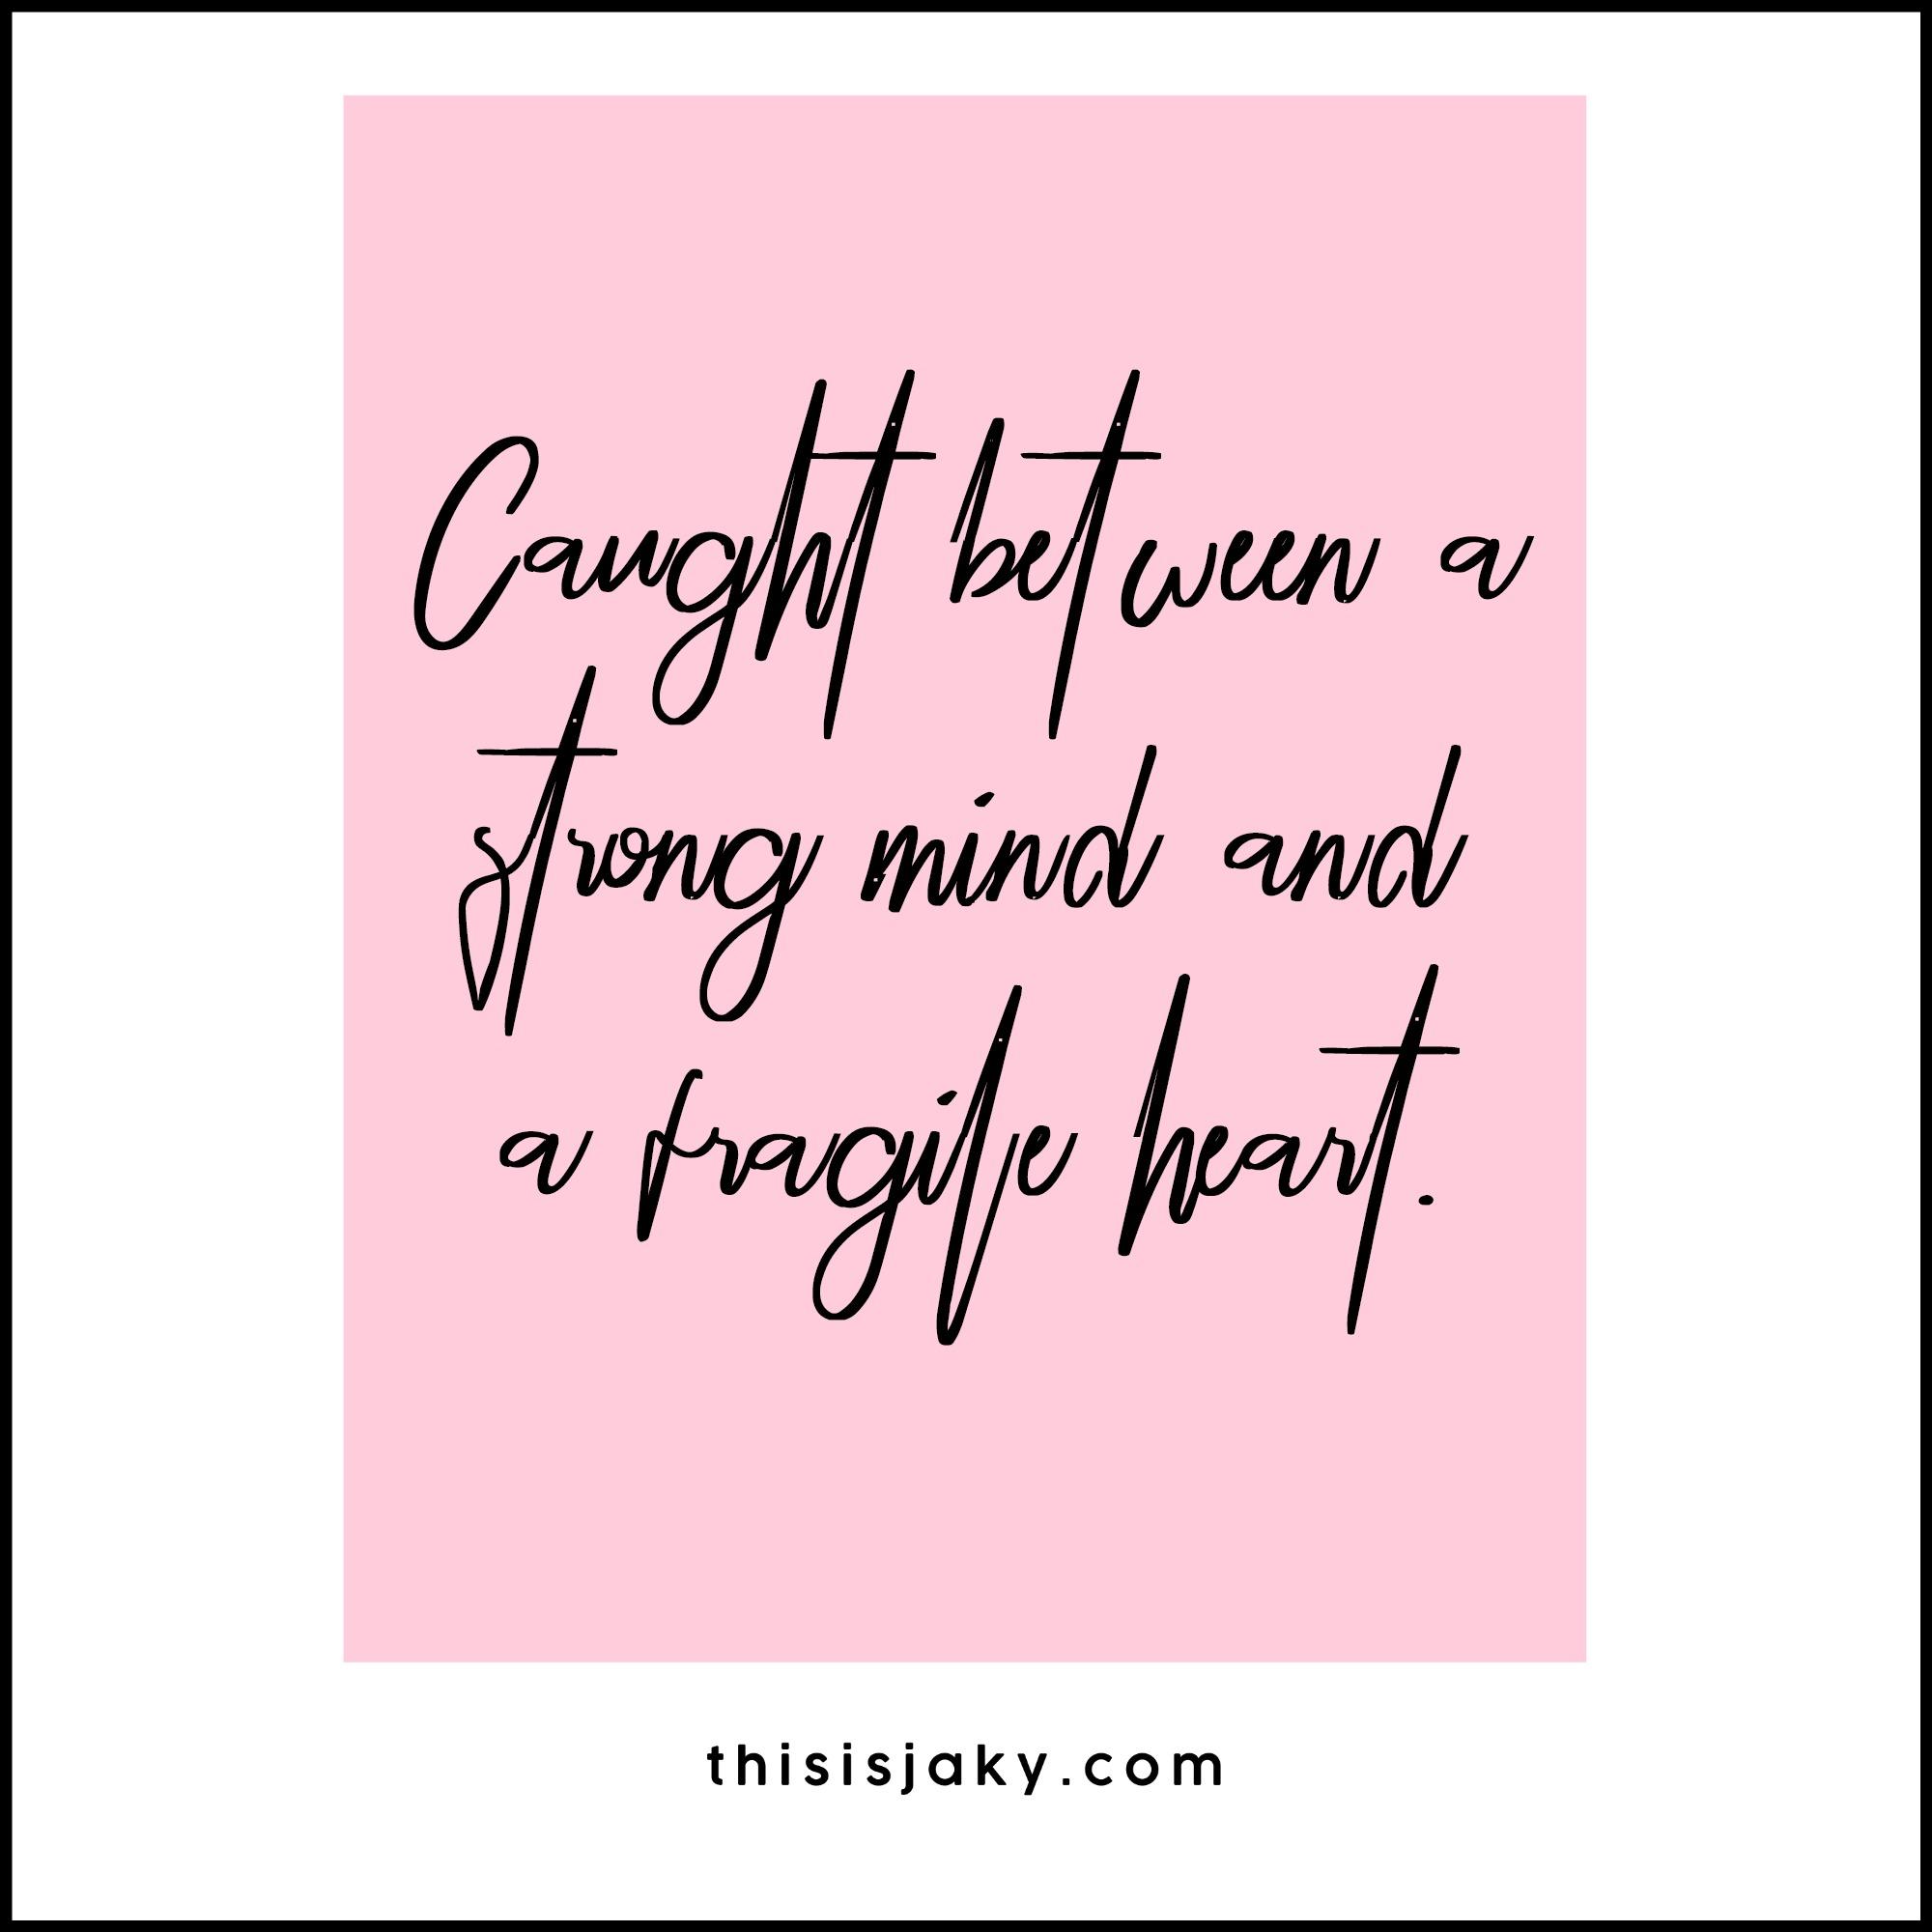 strongmind_fragileheart